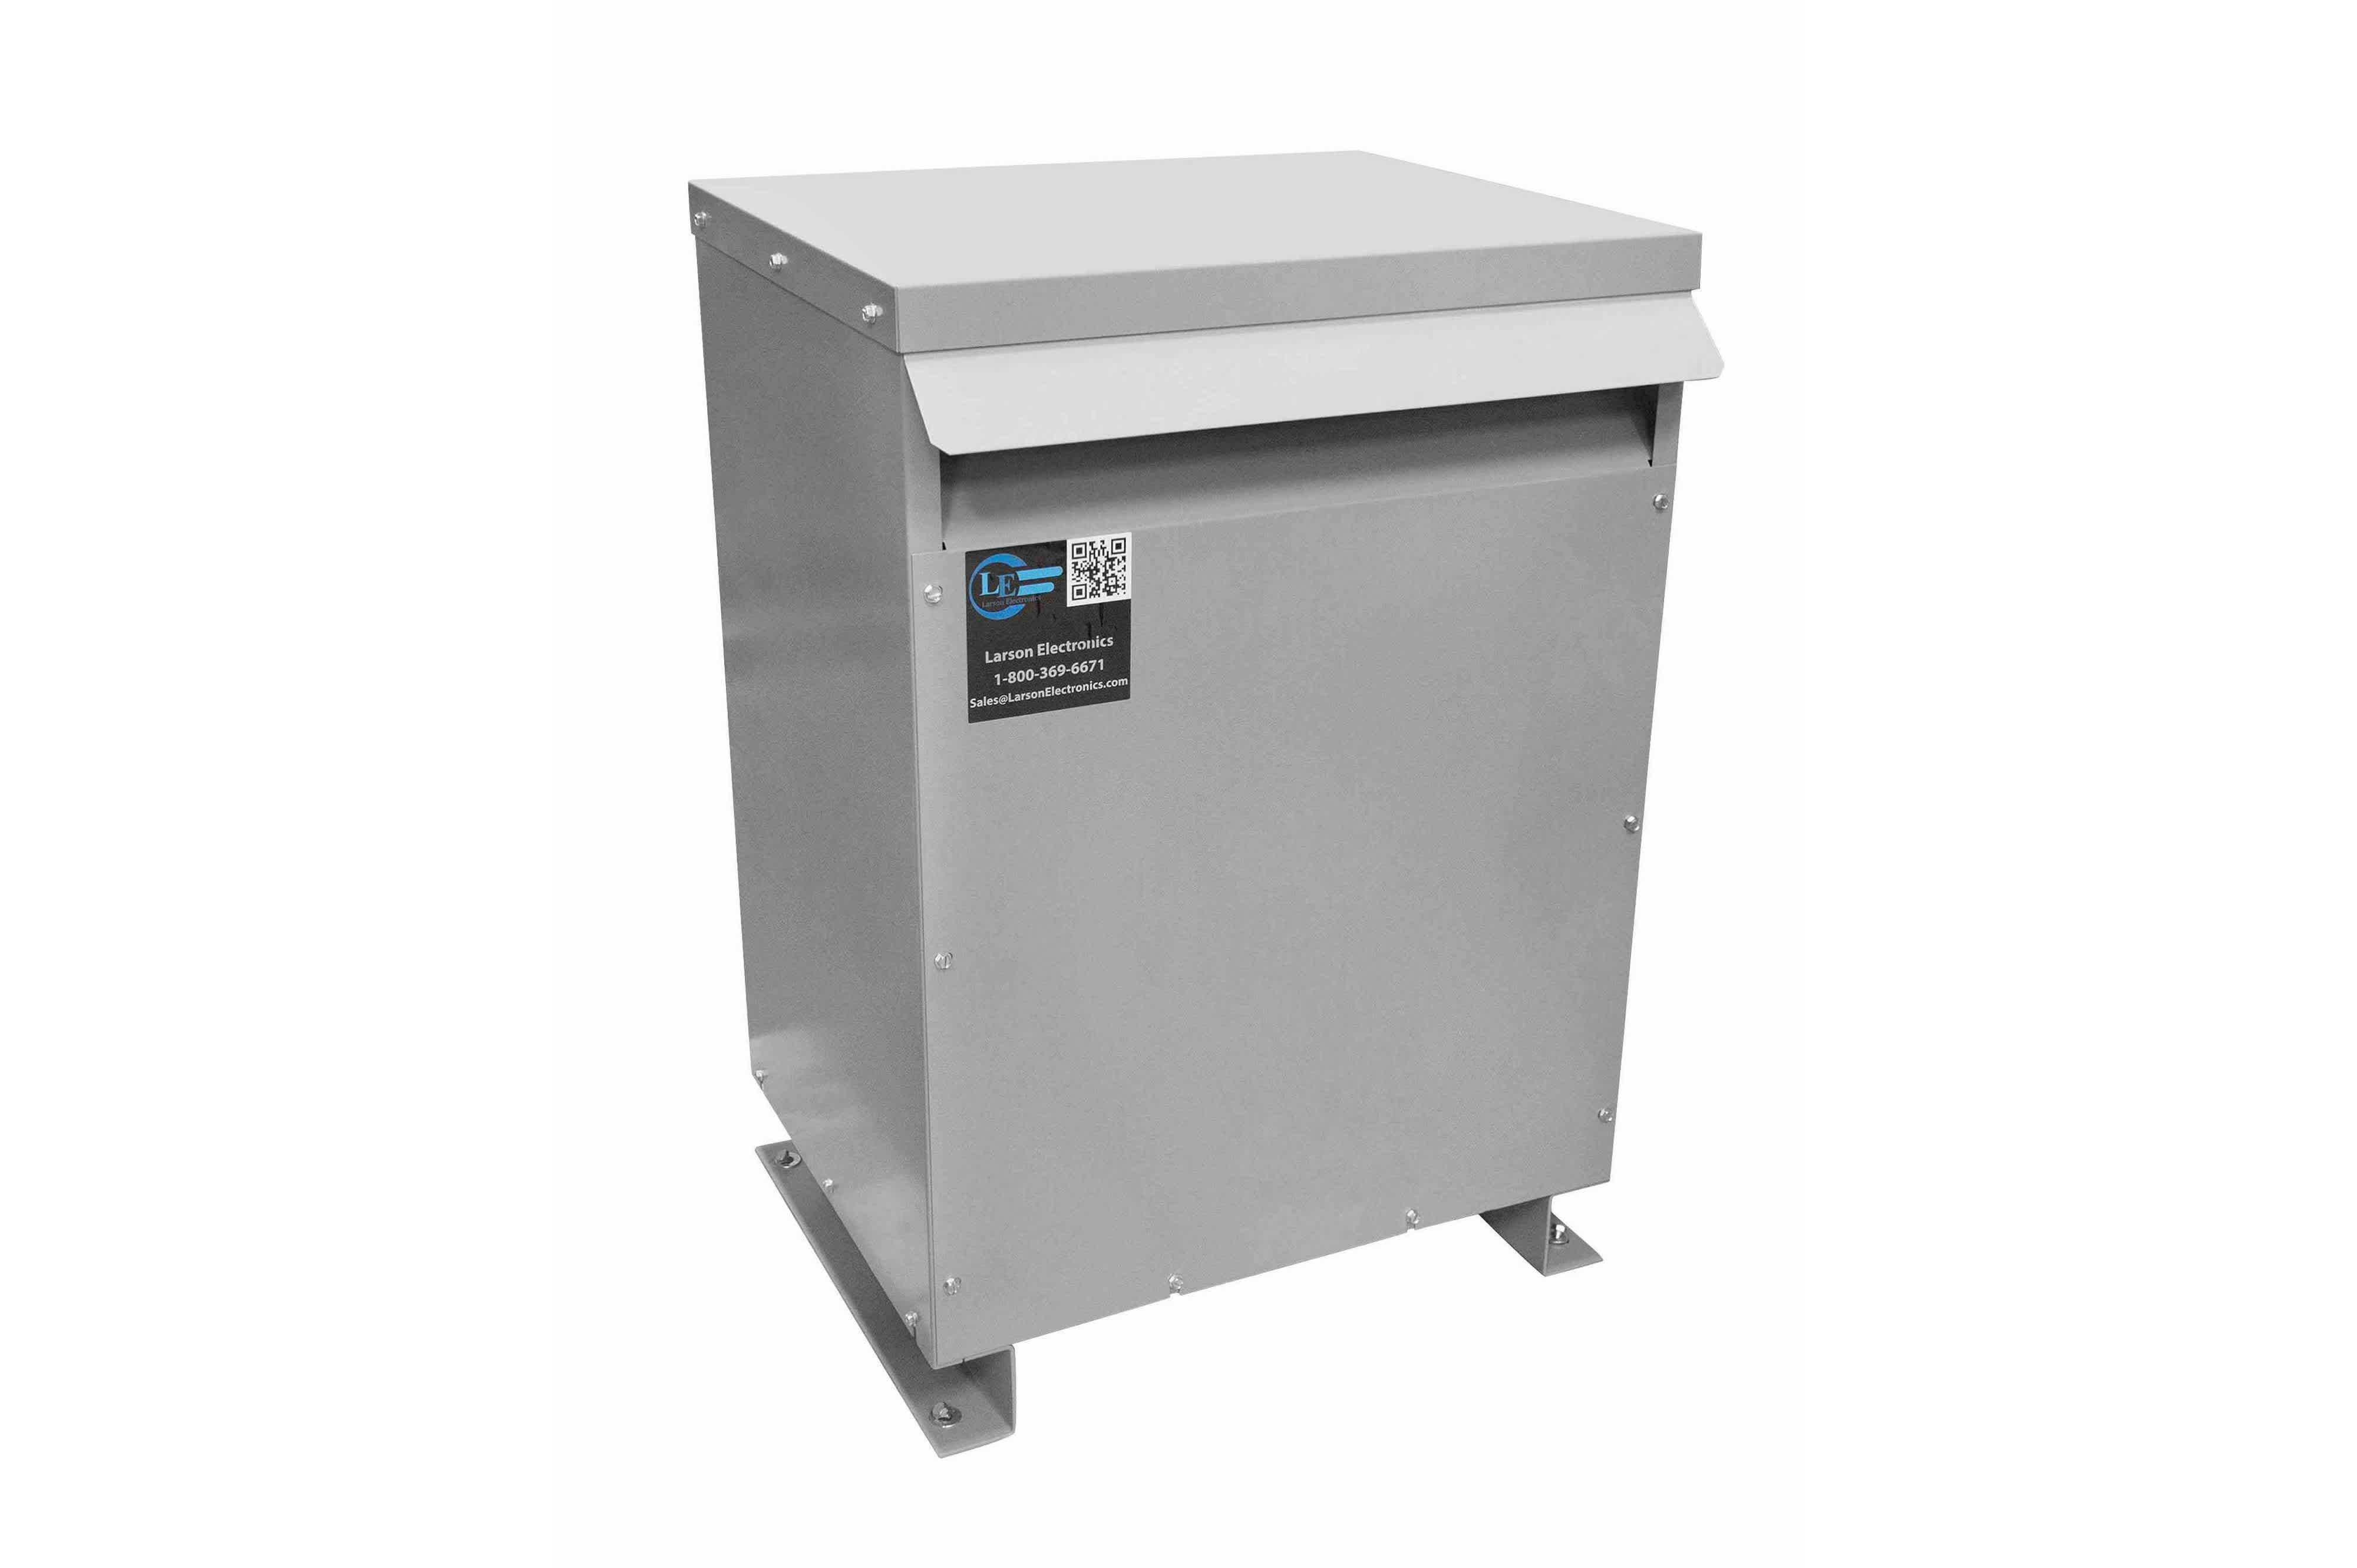 125 kVA 3PH Isolation Transformer, 480V Wye Primary, 208V Delta Secondary, N3R, Ventilated, 60 Hz